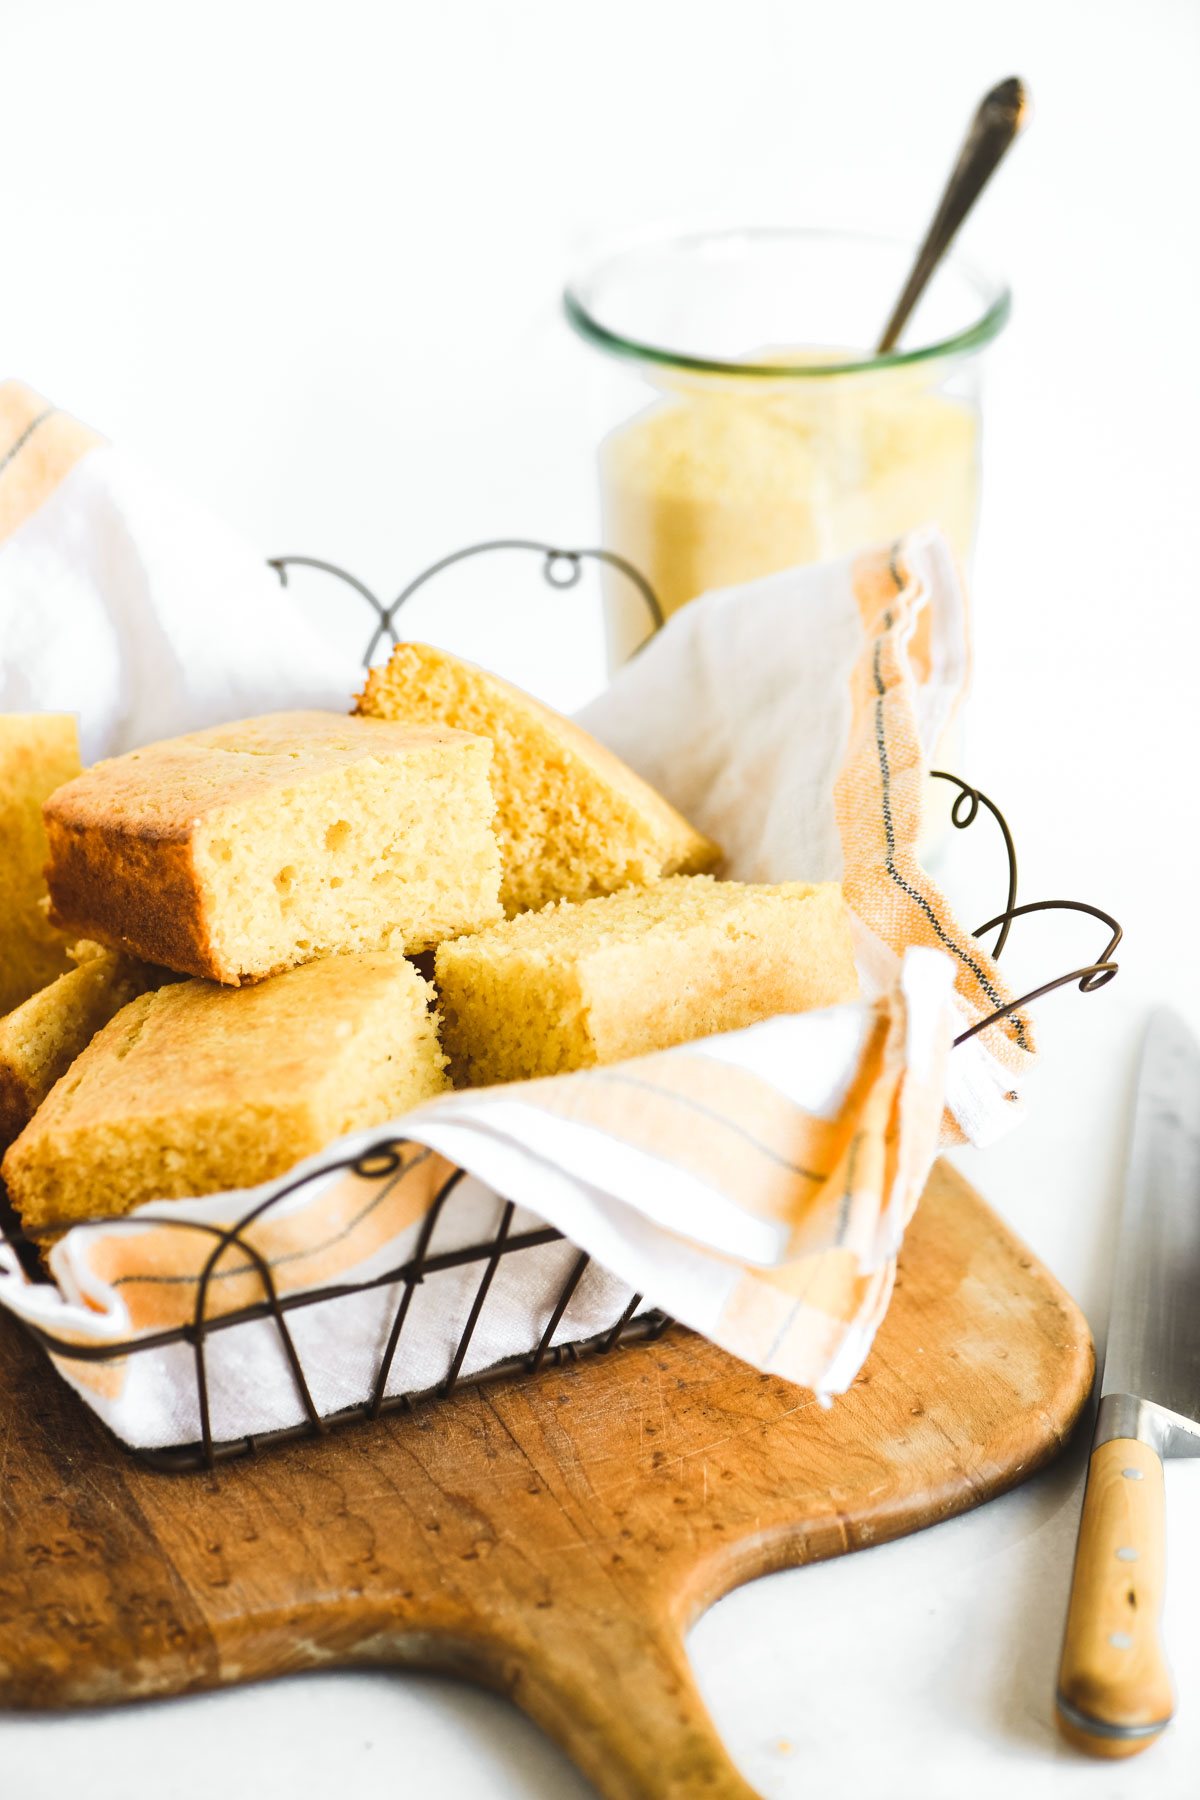 Cornbread in a basket on a wooden cutting board.